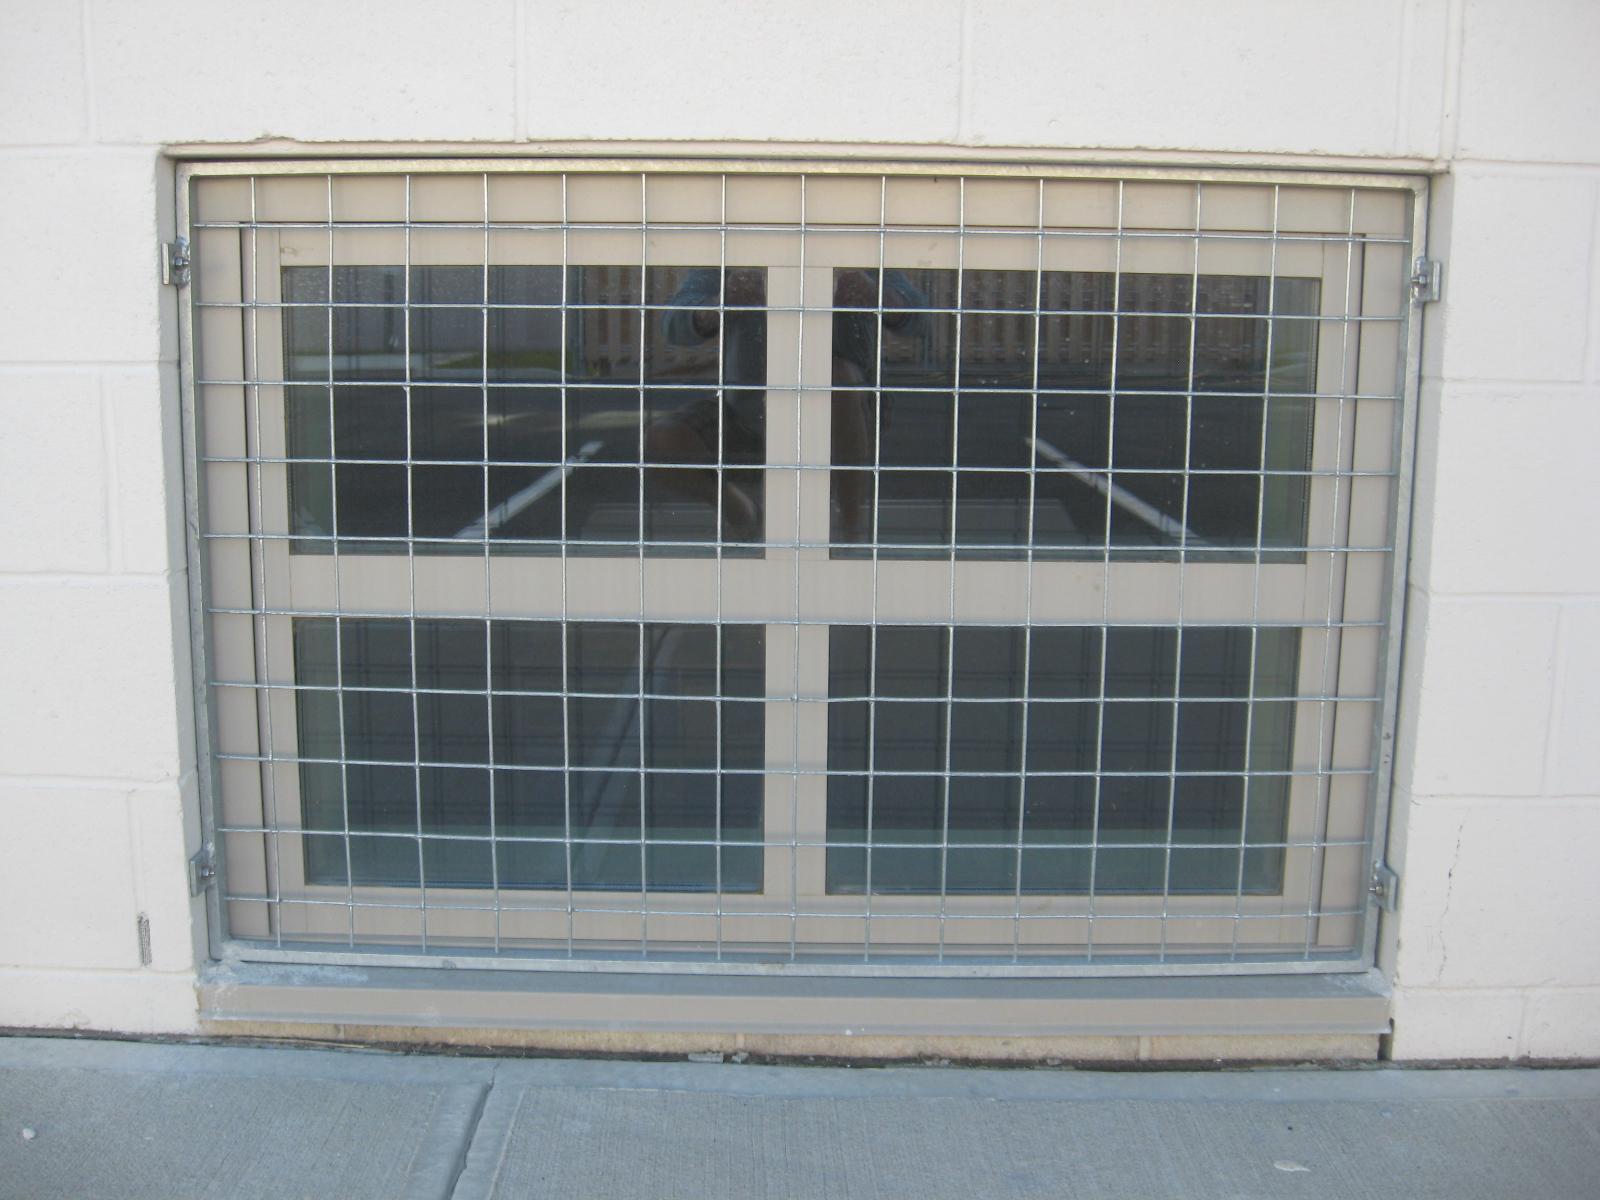 Wire Mesh Fixed Window Guard